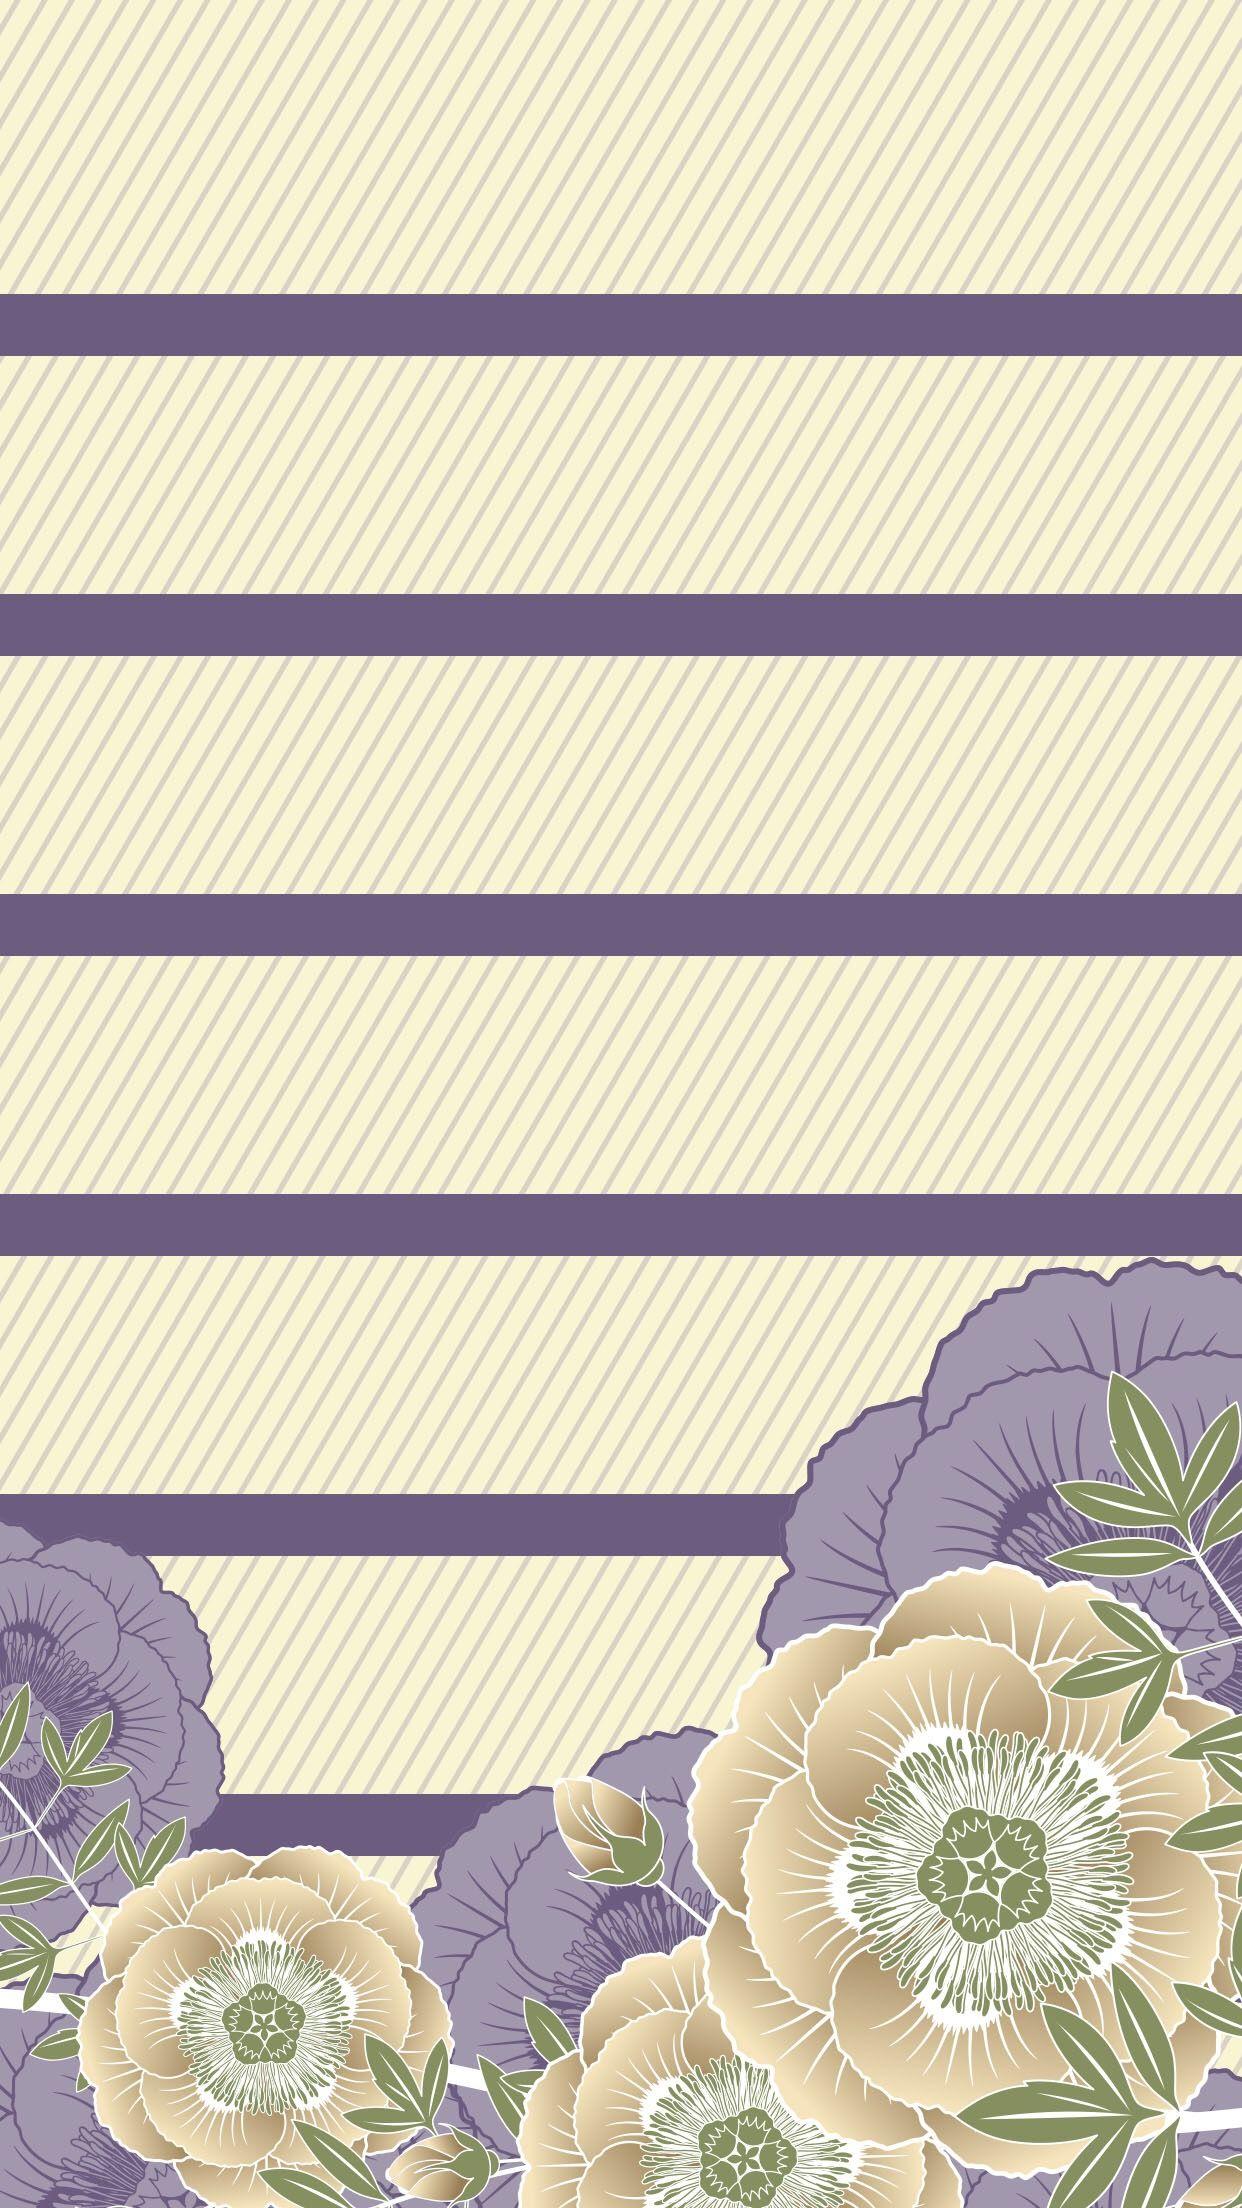 Tap And Get The Free App Shelves Flower Art Beige Purple